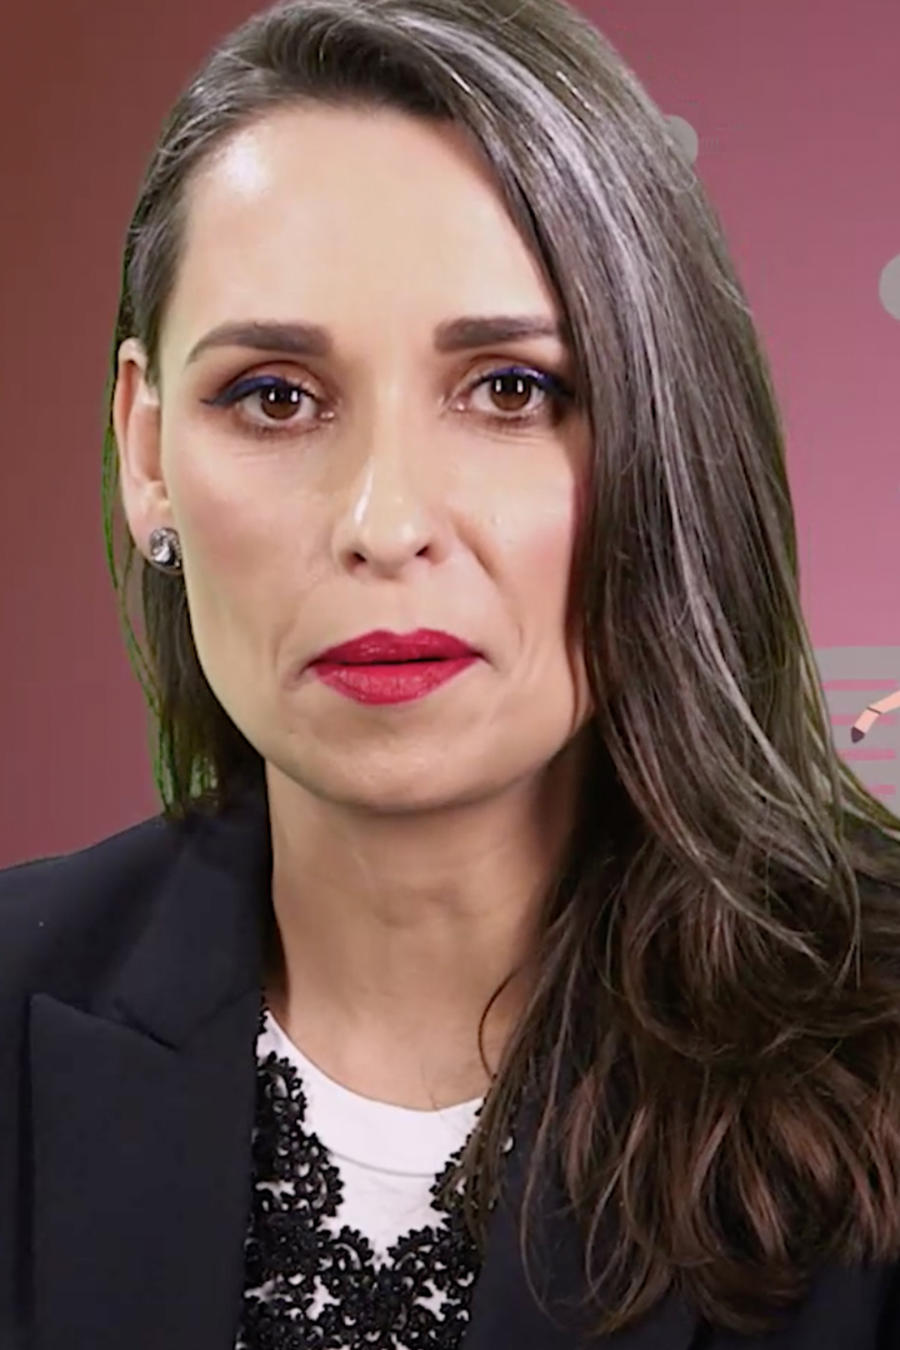 Regina Merson